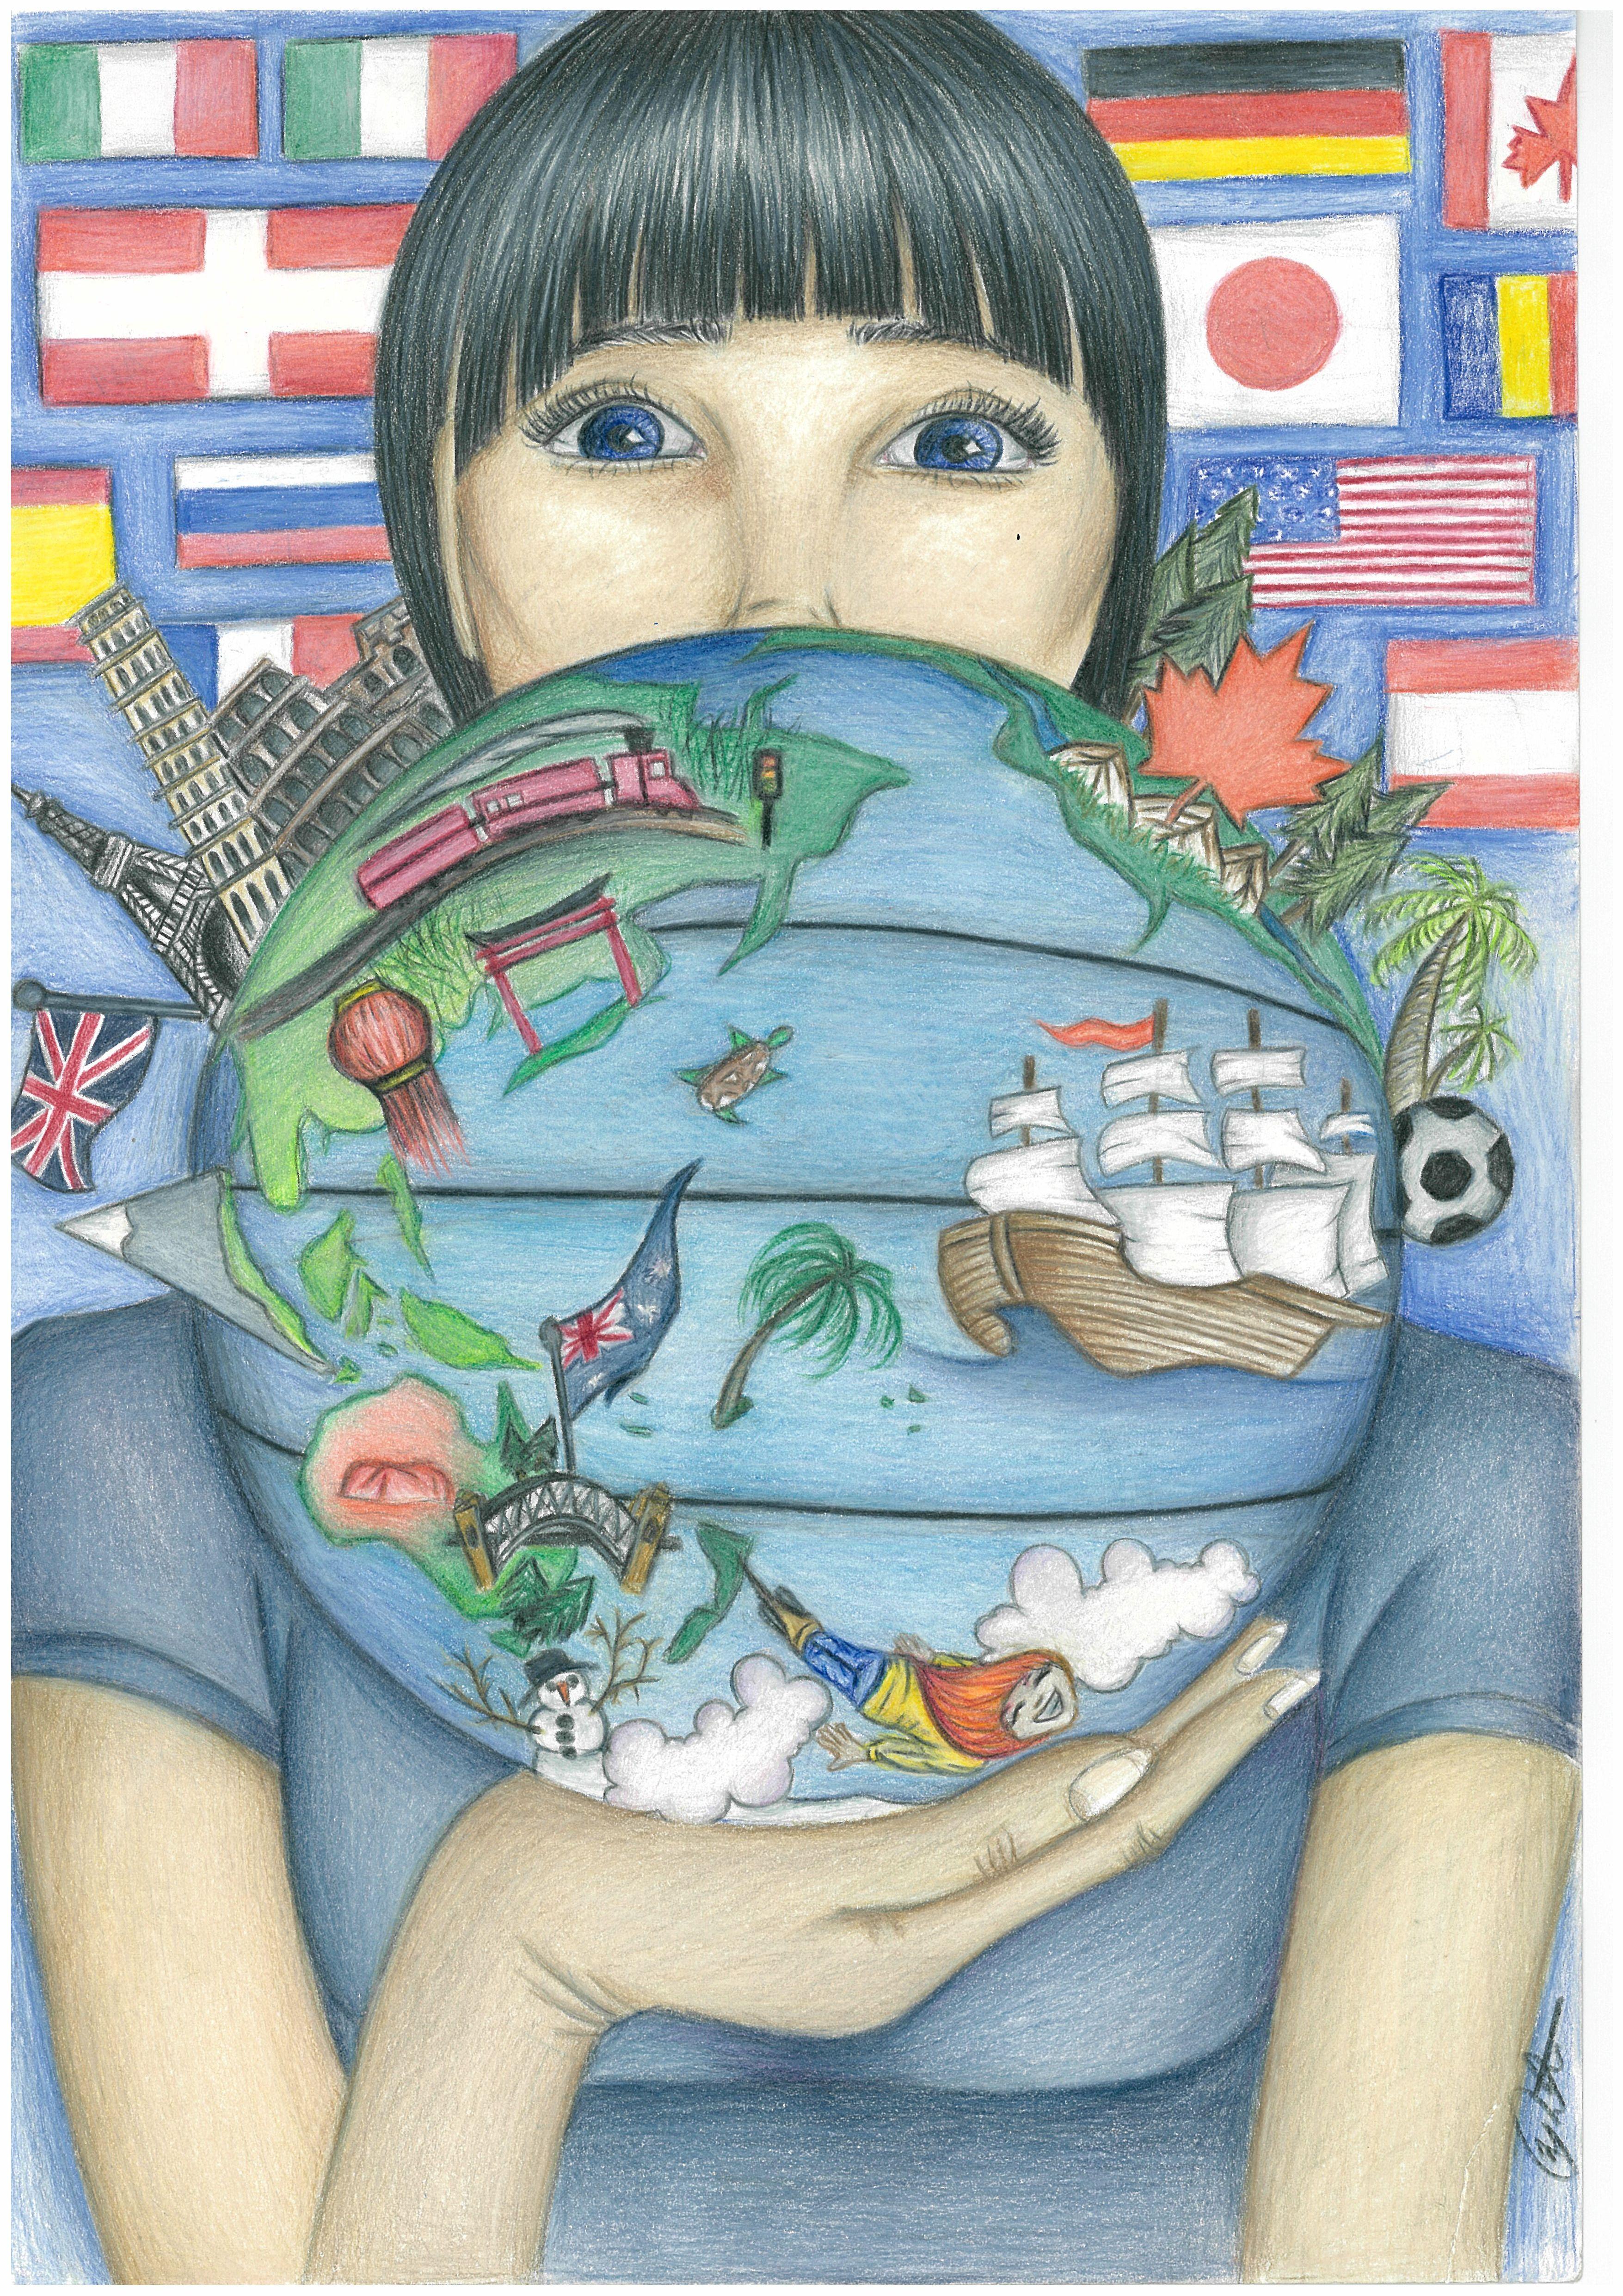 12 - Me.Maps@PlanetEarth.Com Lilian Petrovski - Age 14